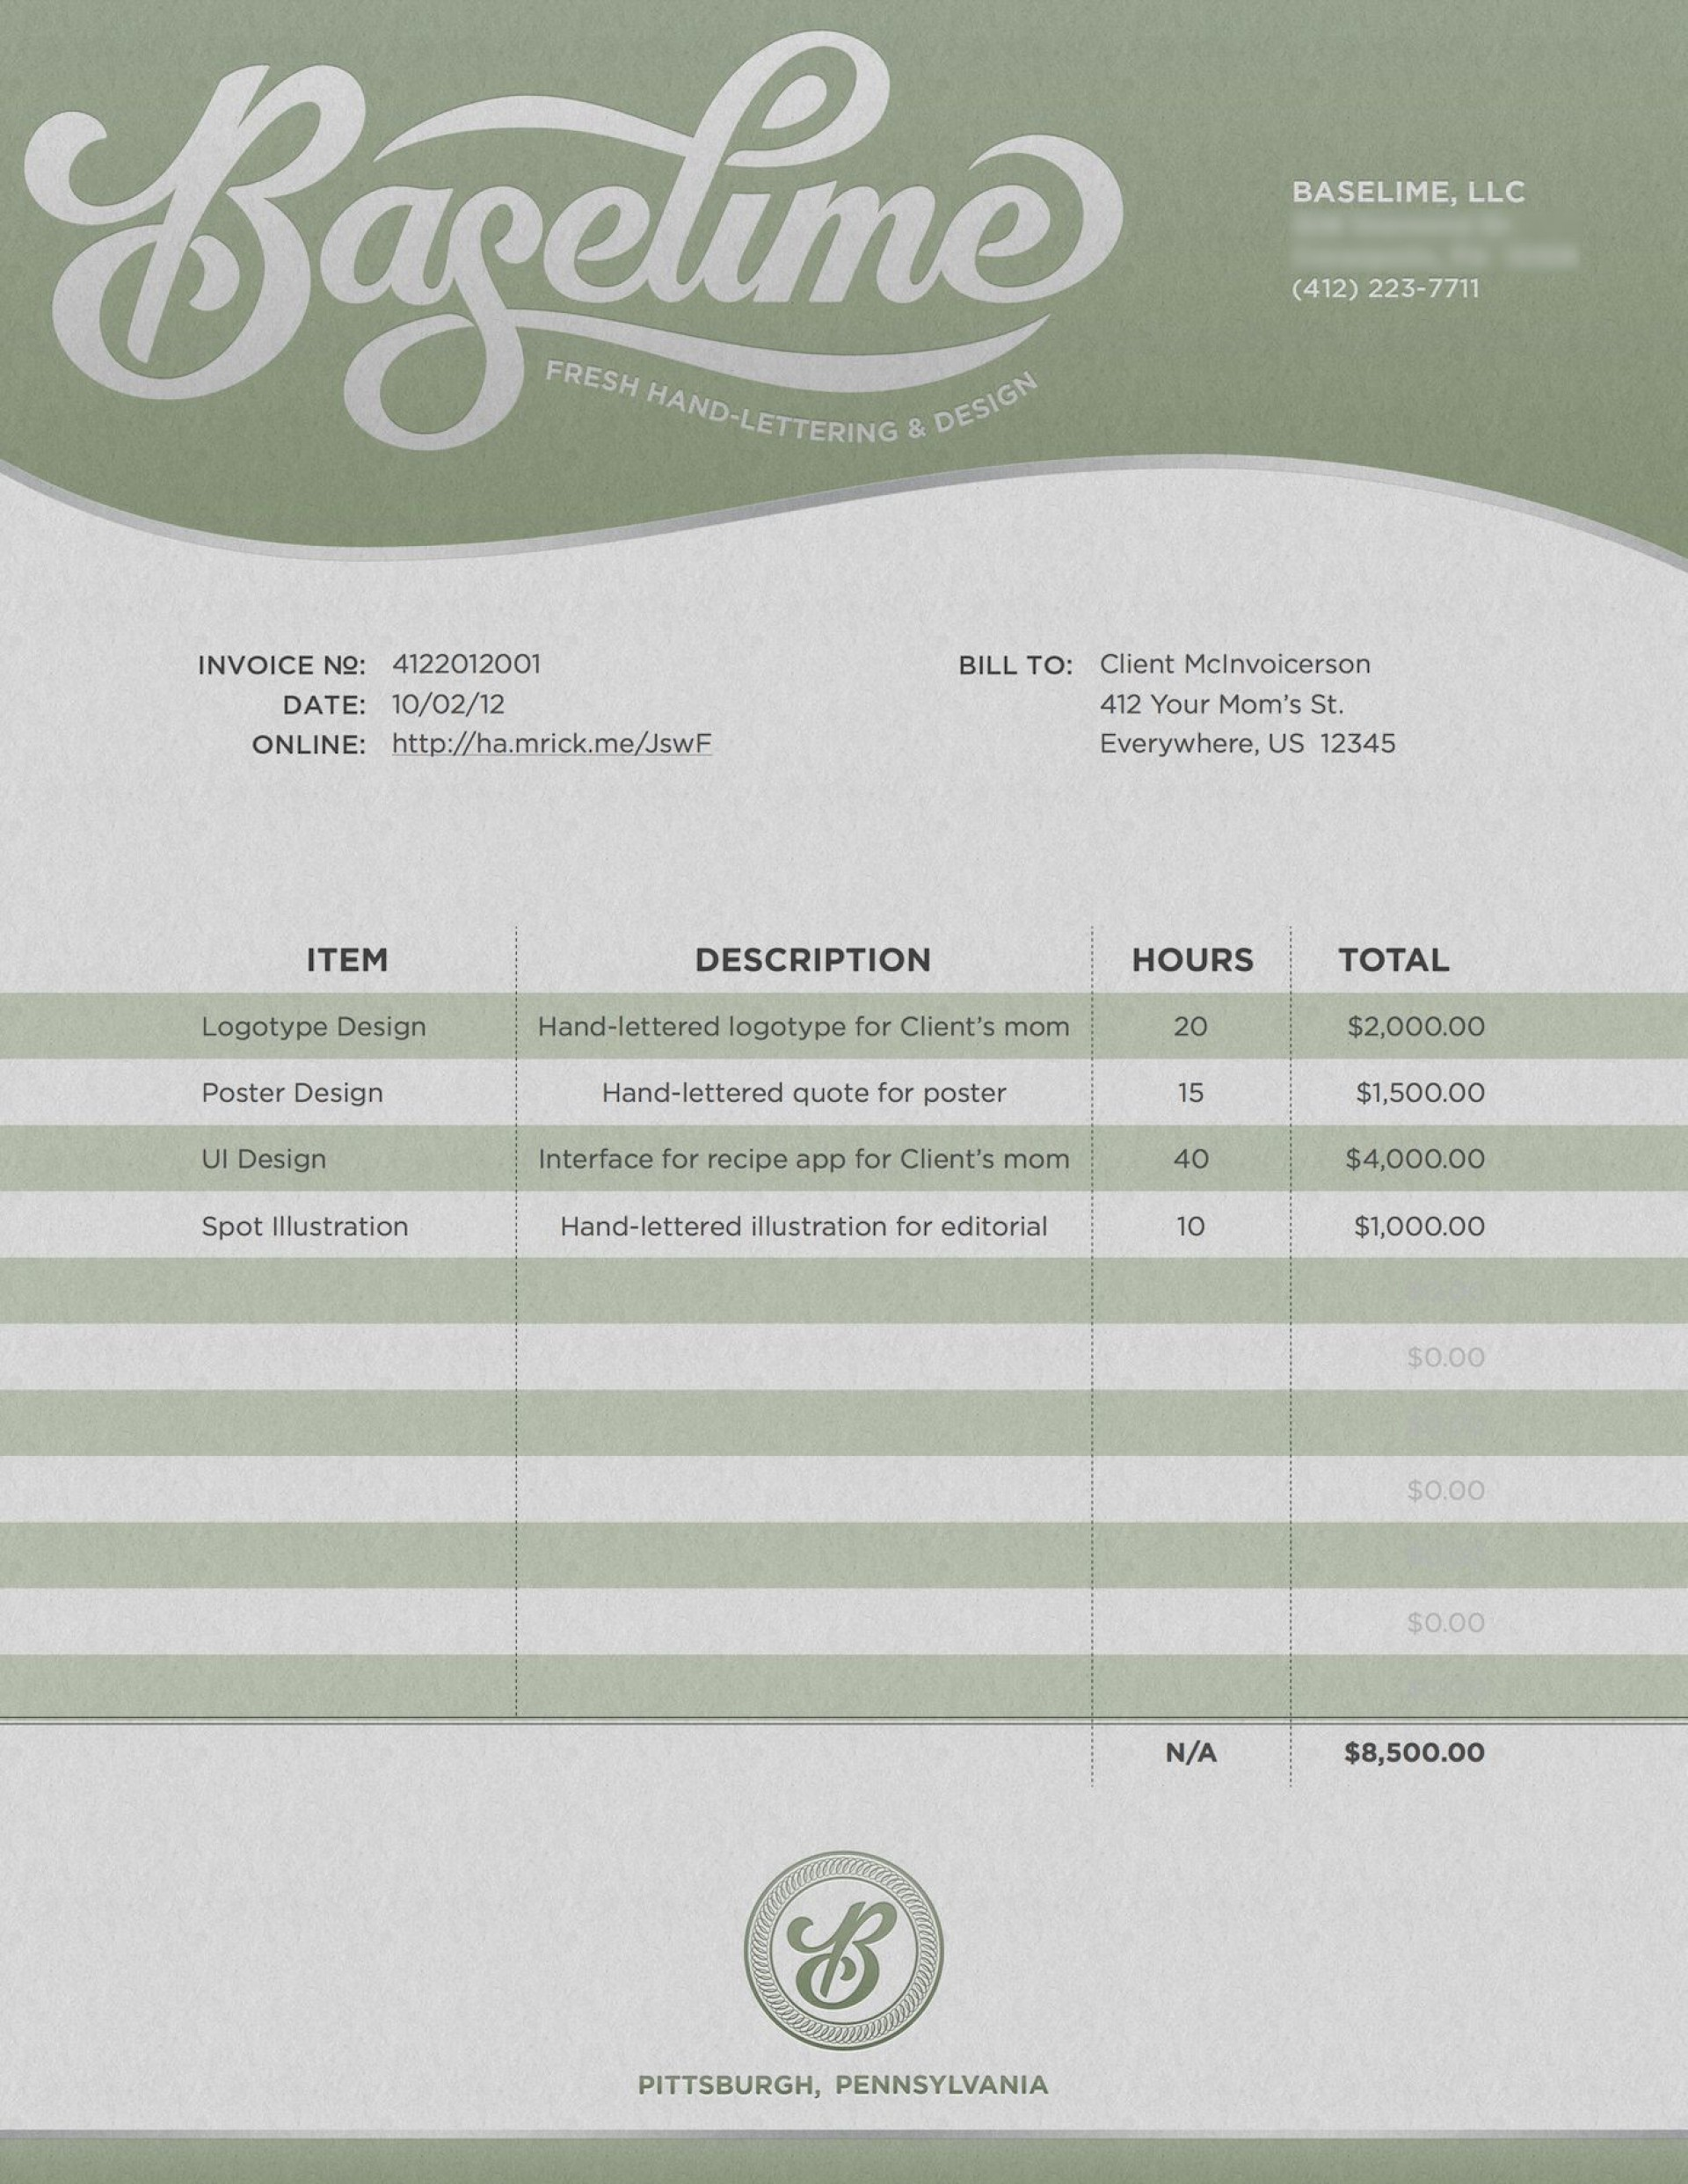 002 Awesome Freelance Graphic Designer Invoice Sample Highest Clarity 1920